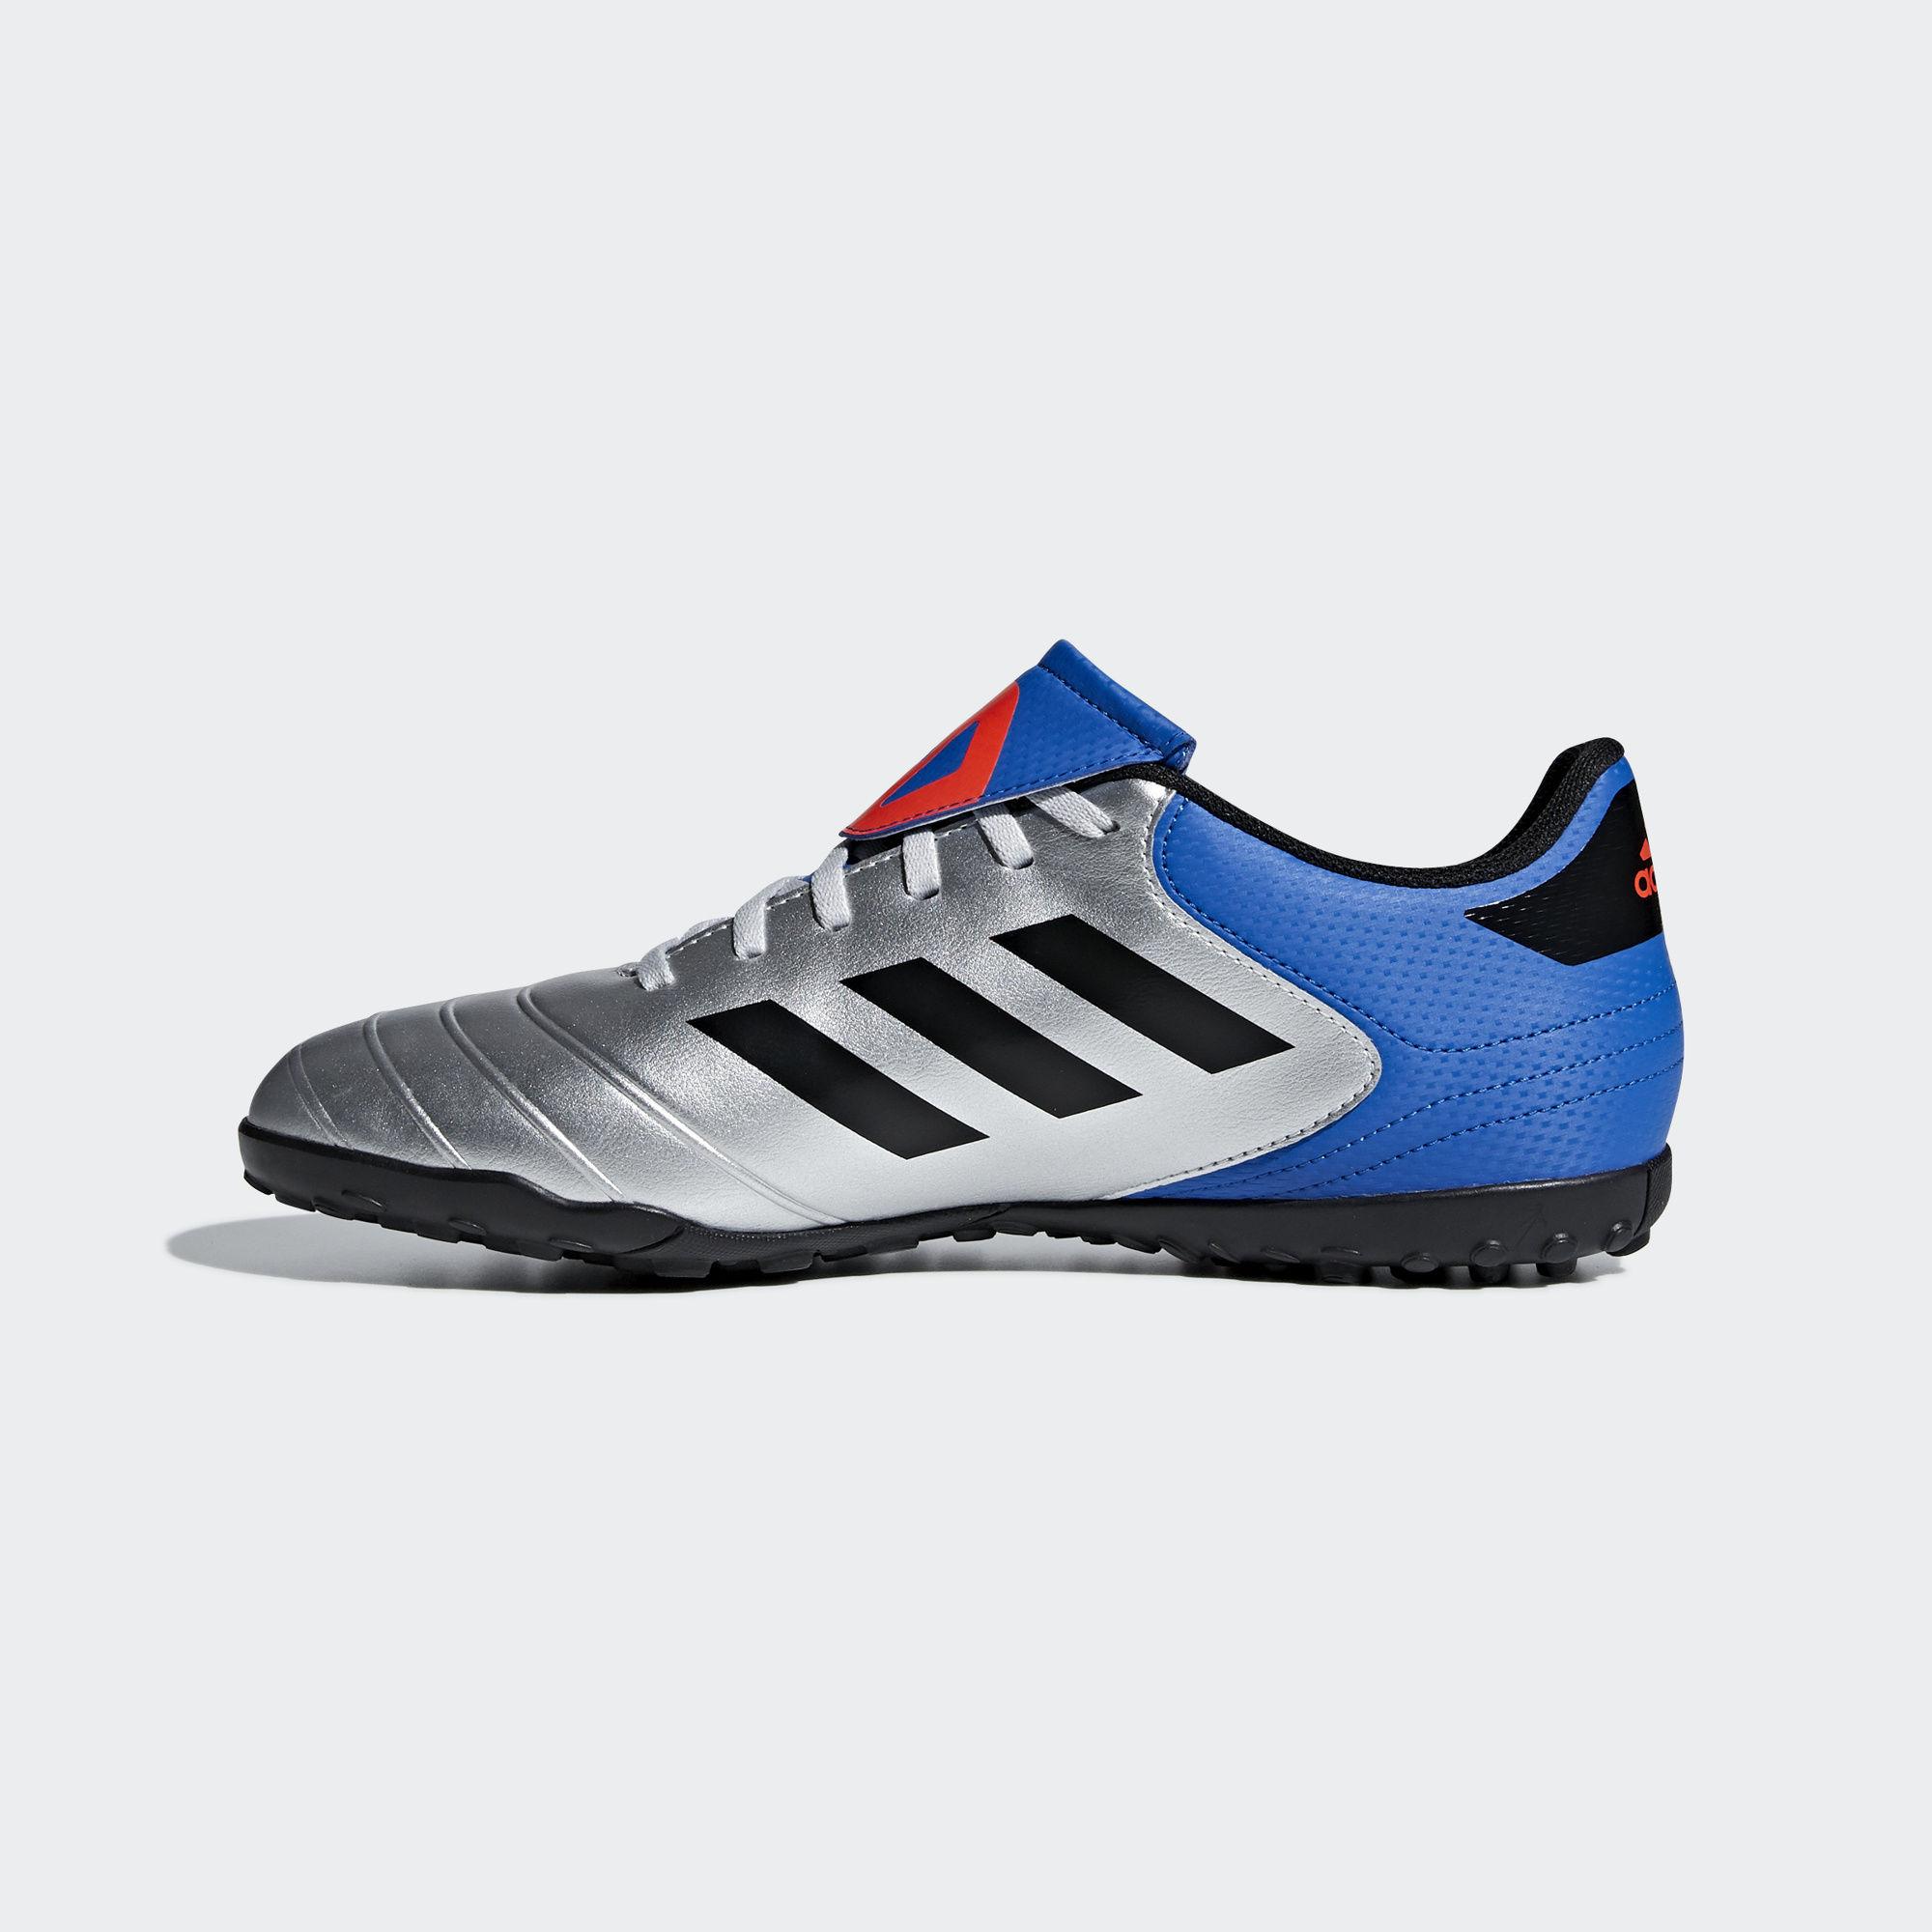 Football-shoes-Adidas-Scarpe-Calcio-Copa-Tango-18-4-Silver-Calcetto-Turf-2018 miniatura 7